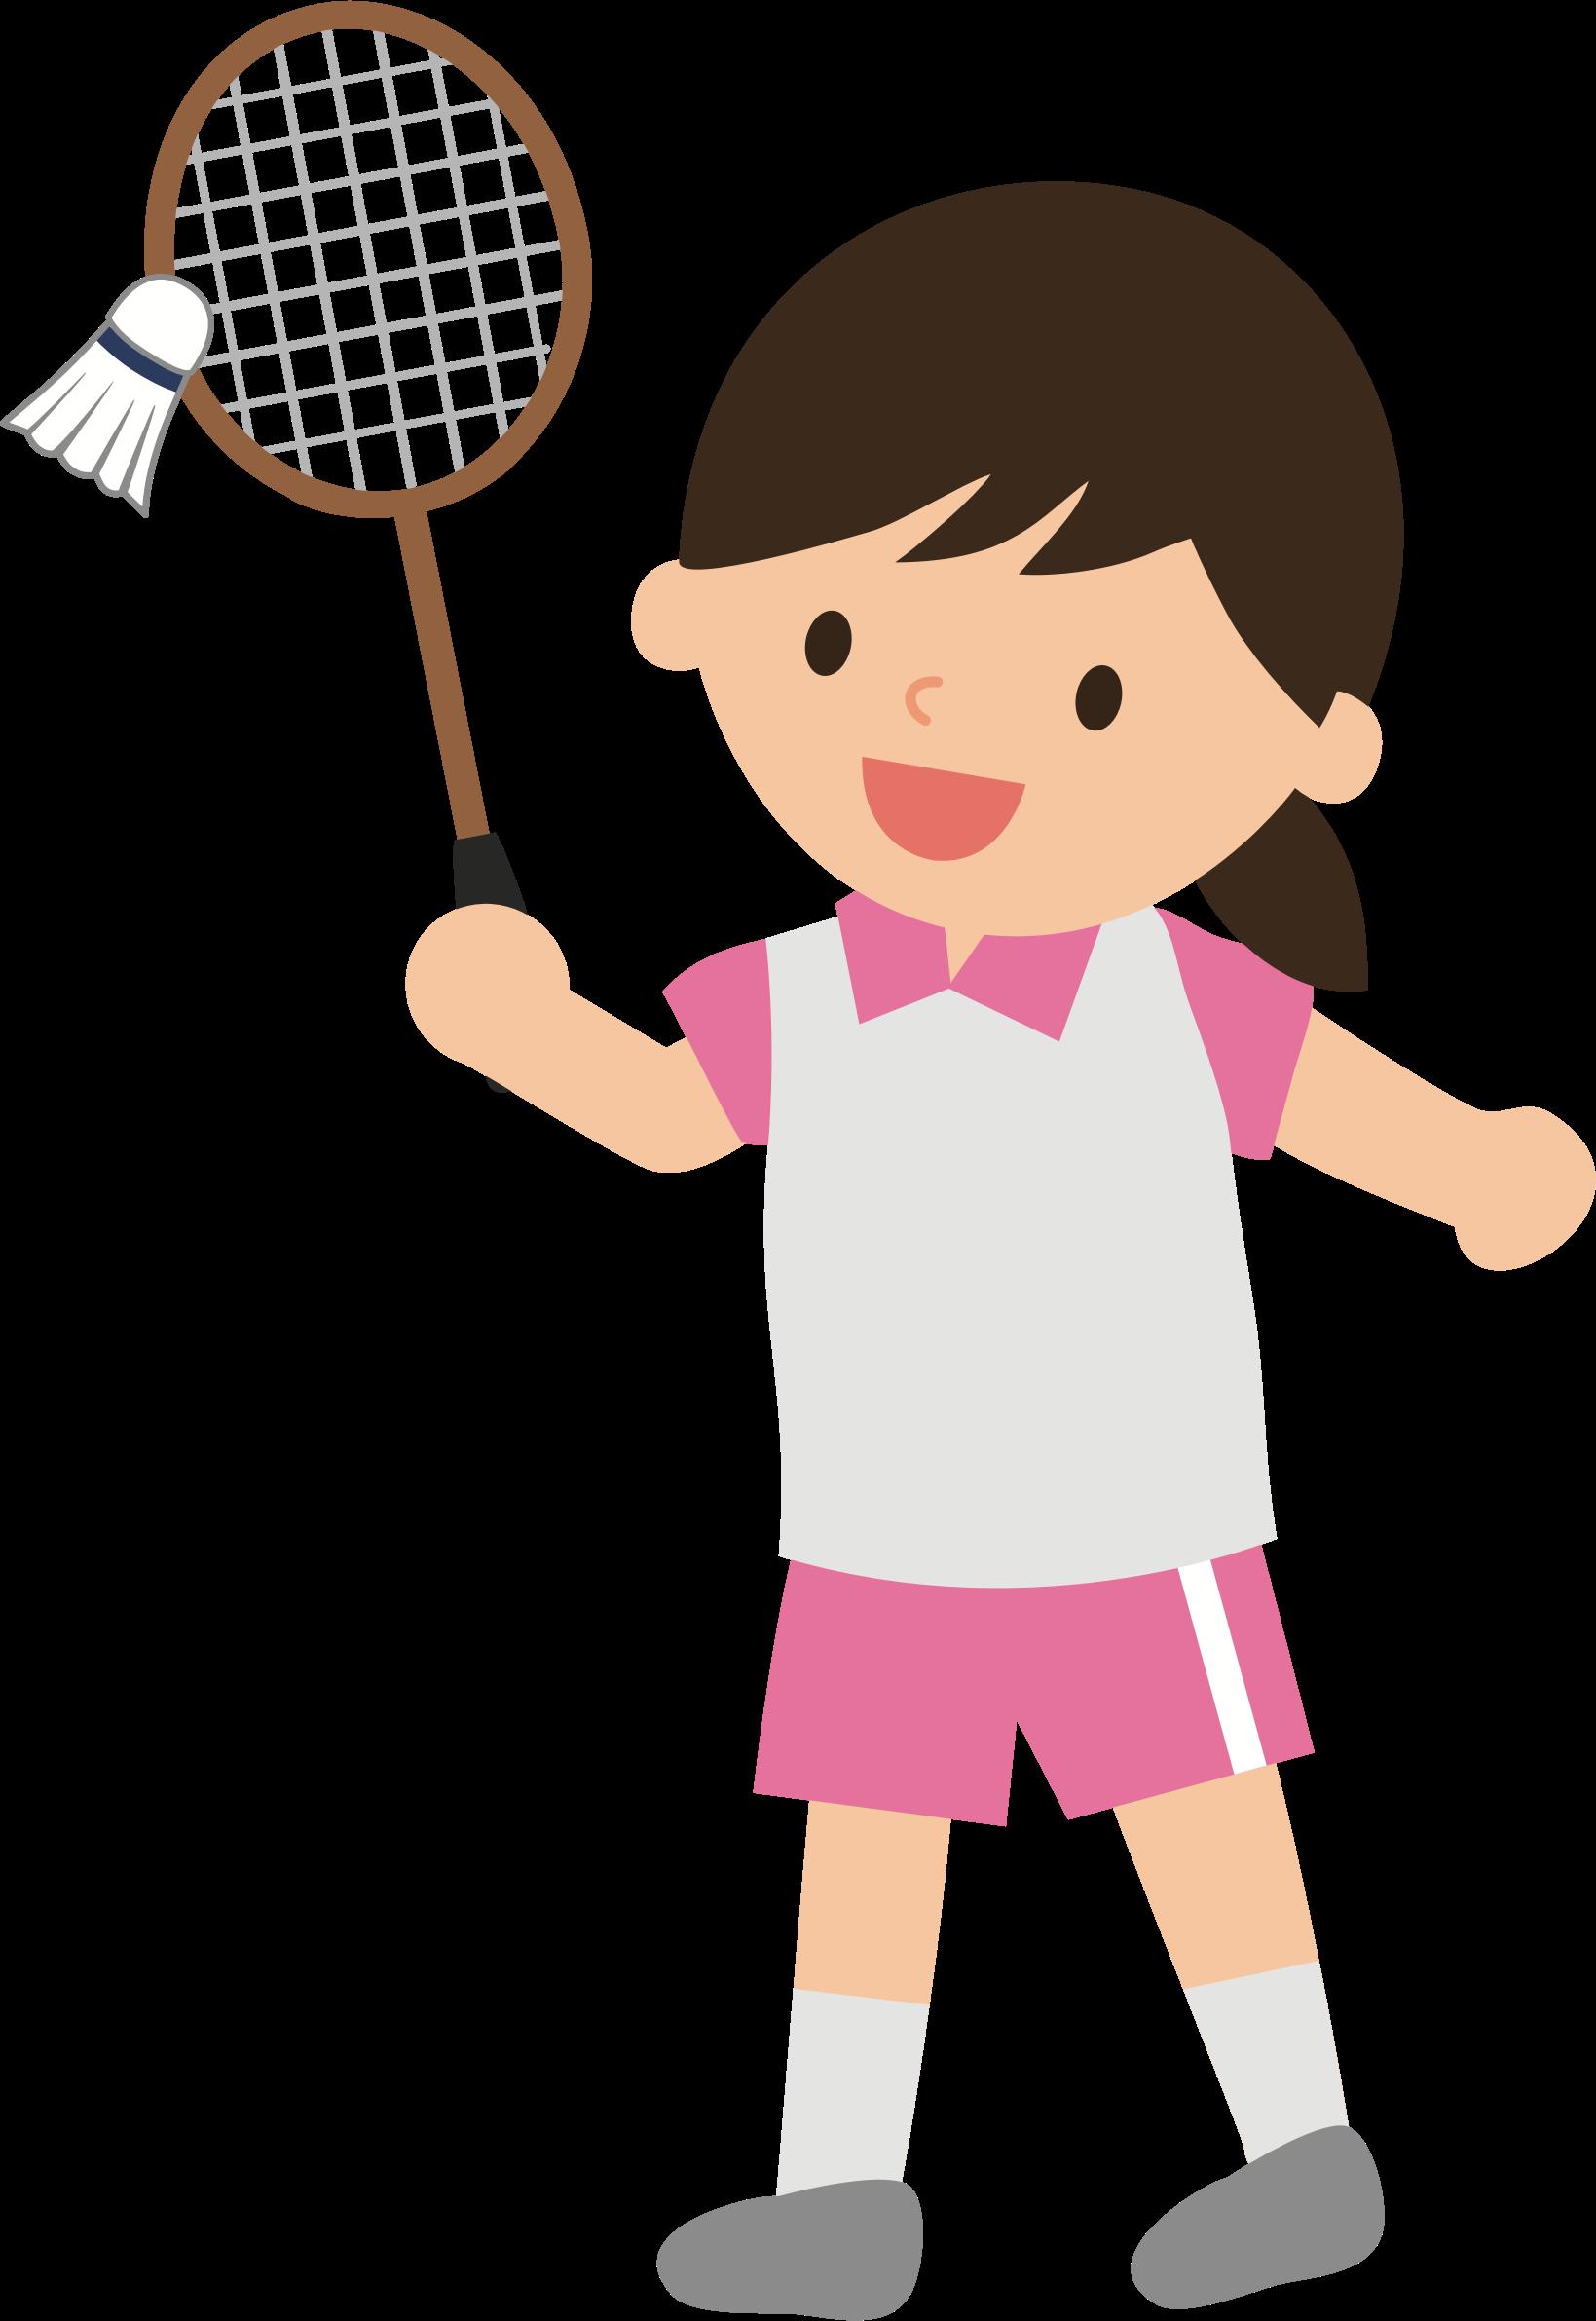 clipart badminton women clip art golf women clip art pictures